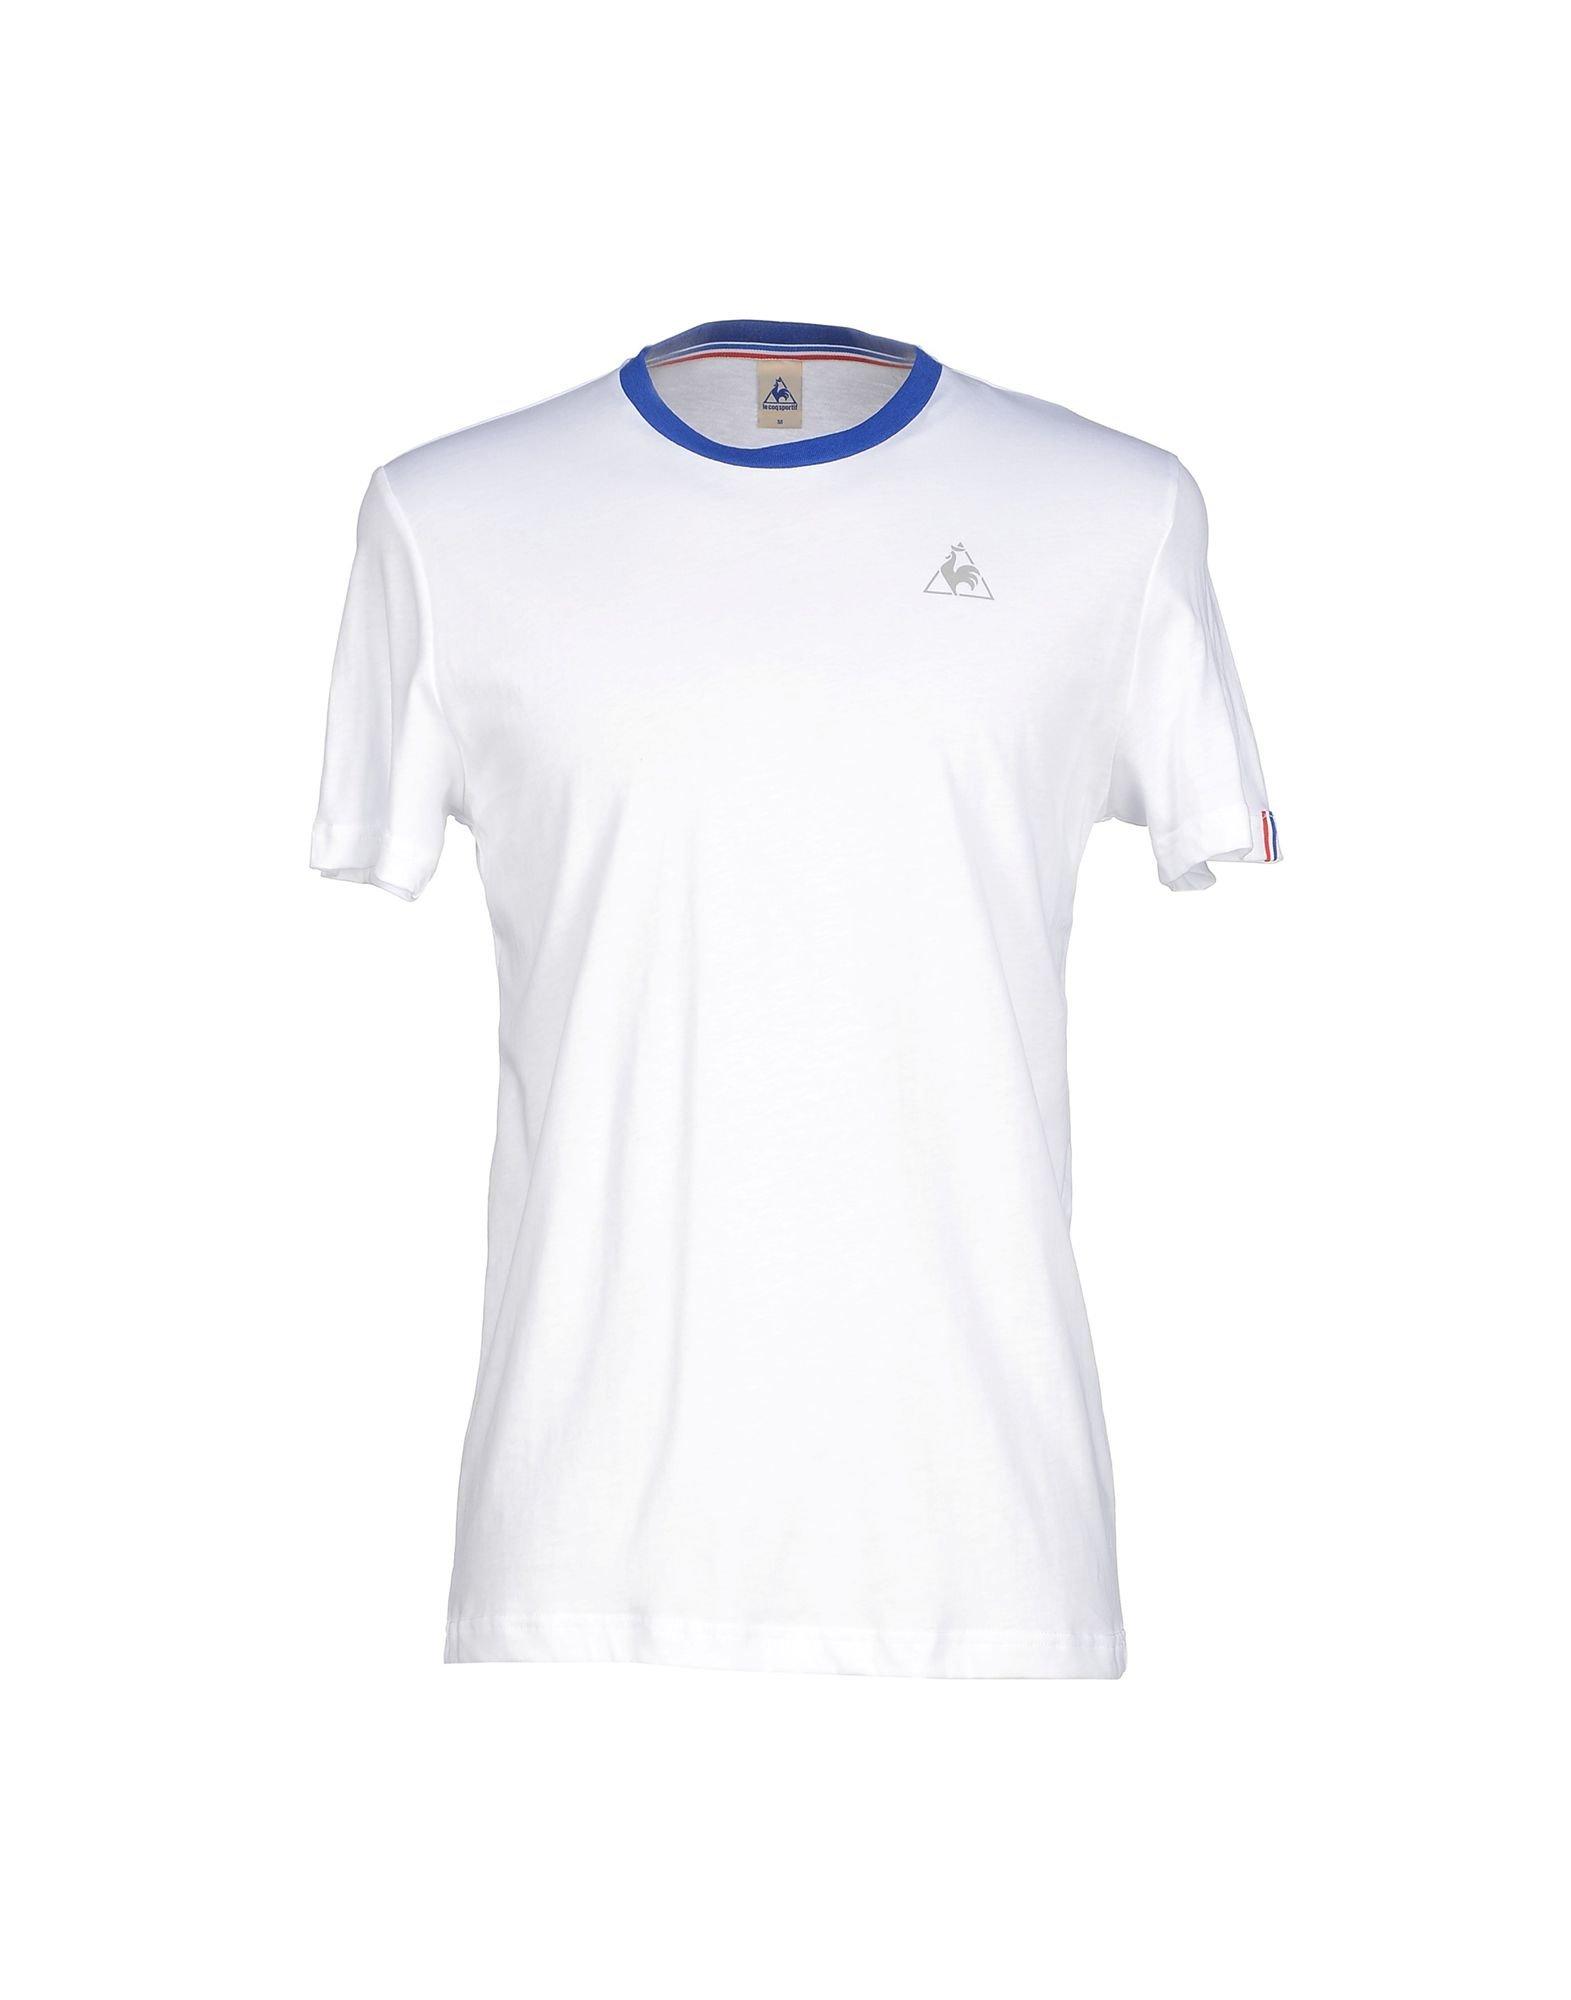 le coq sportif shirt - photo #27